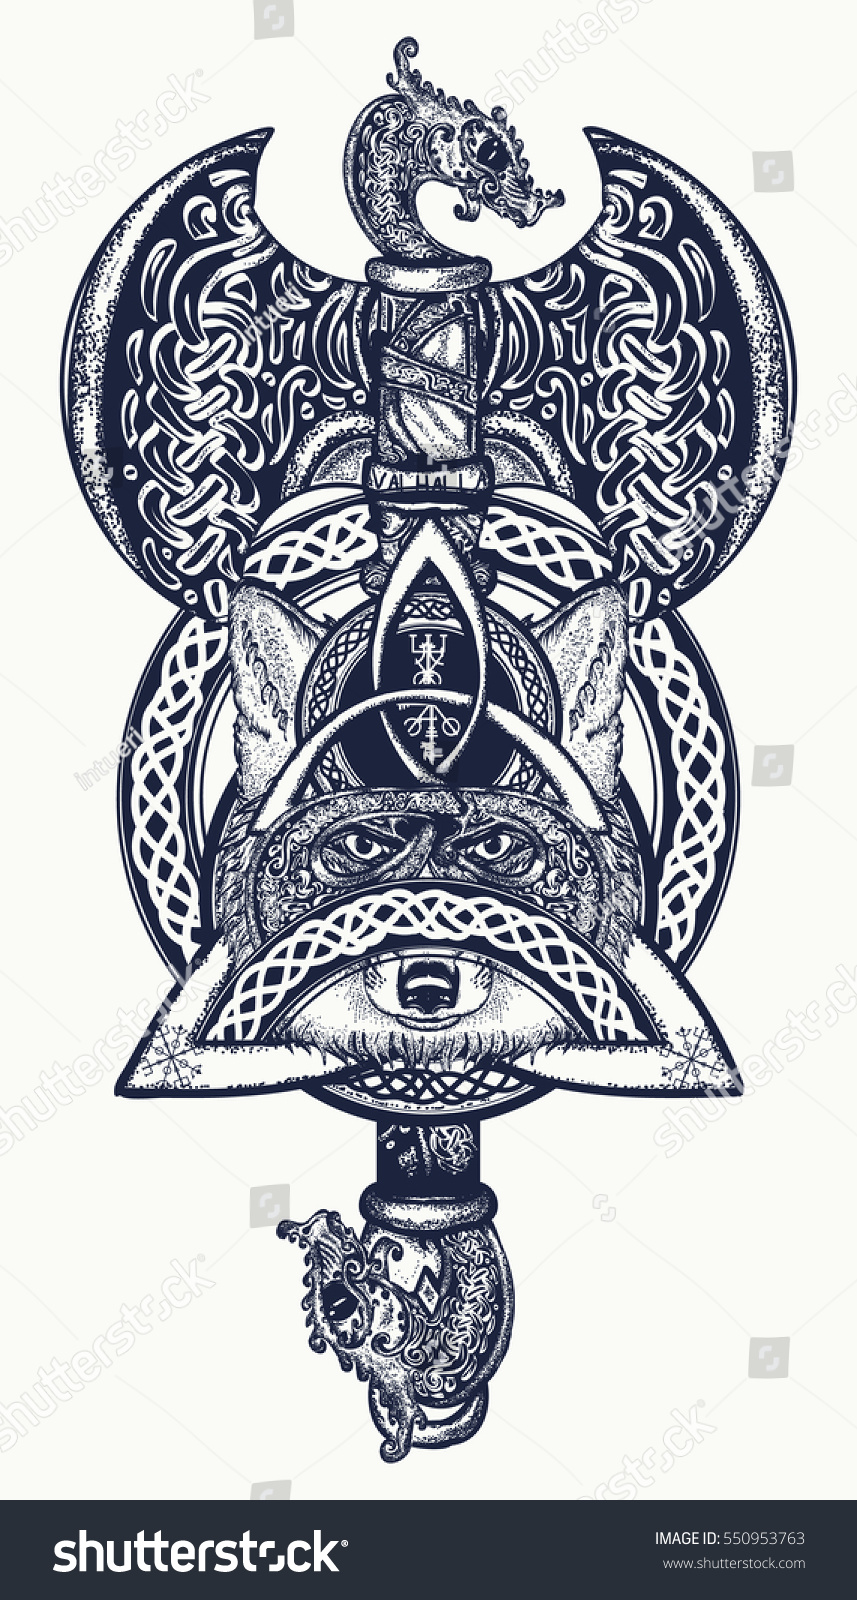 thors hammer tattoo axe viking warrior stock vector 550953763 shutterstock. Black Bedroom Furniture Sets. Home Design Ideas